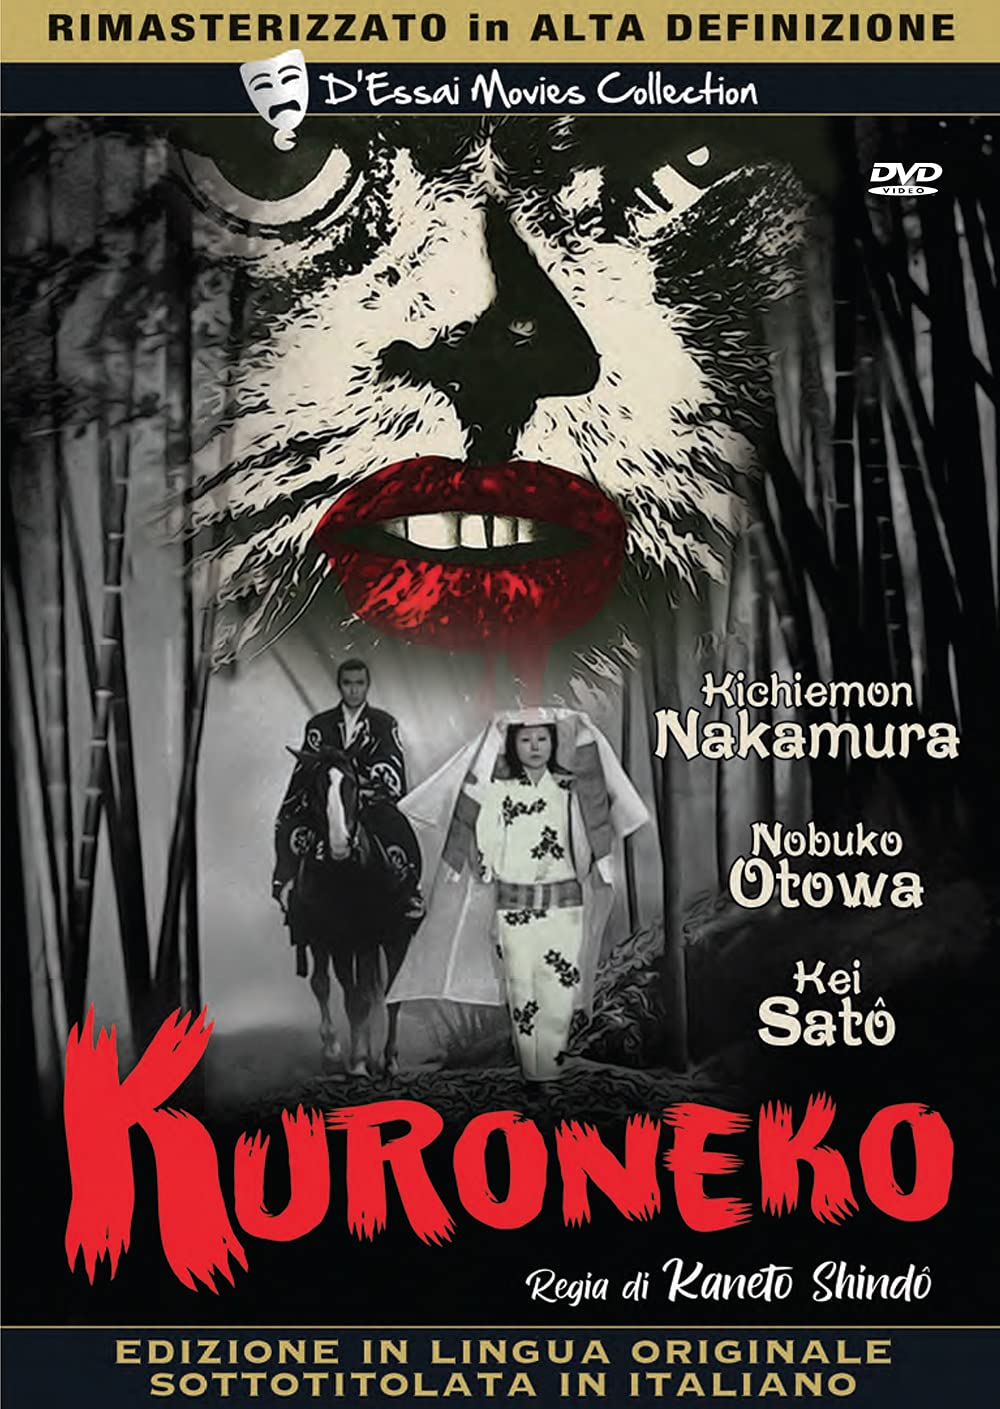 KURONEKO - AUDIO GIAPPONESE - (DVD)